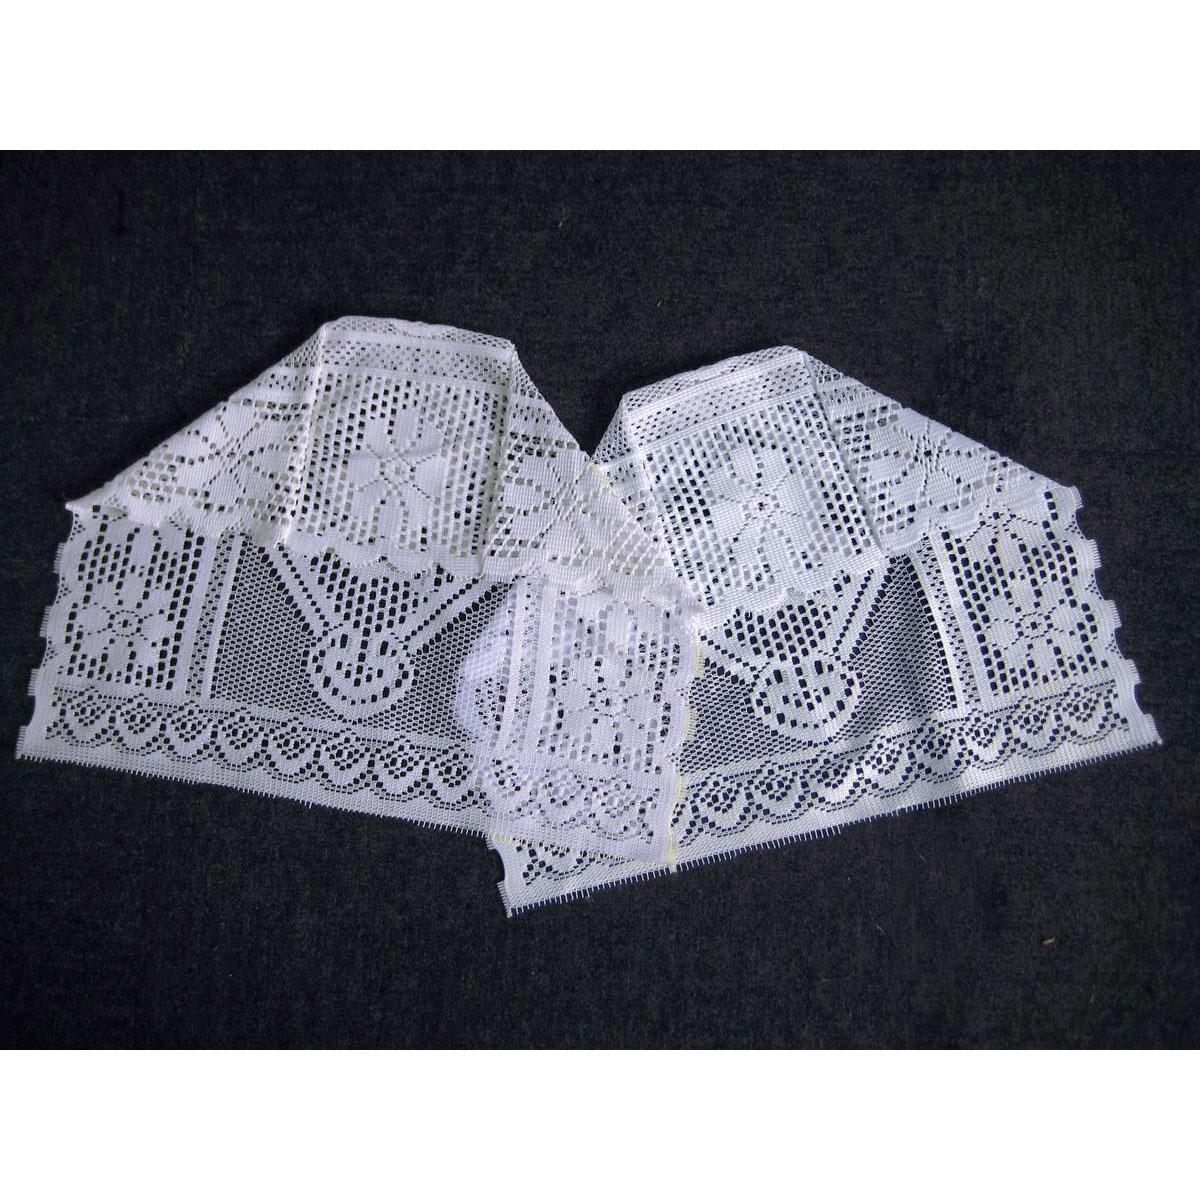 Traditional Lace Arm Caps - Floral Jacquard Lace Sofa ...